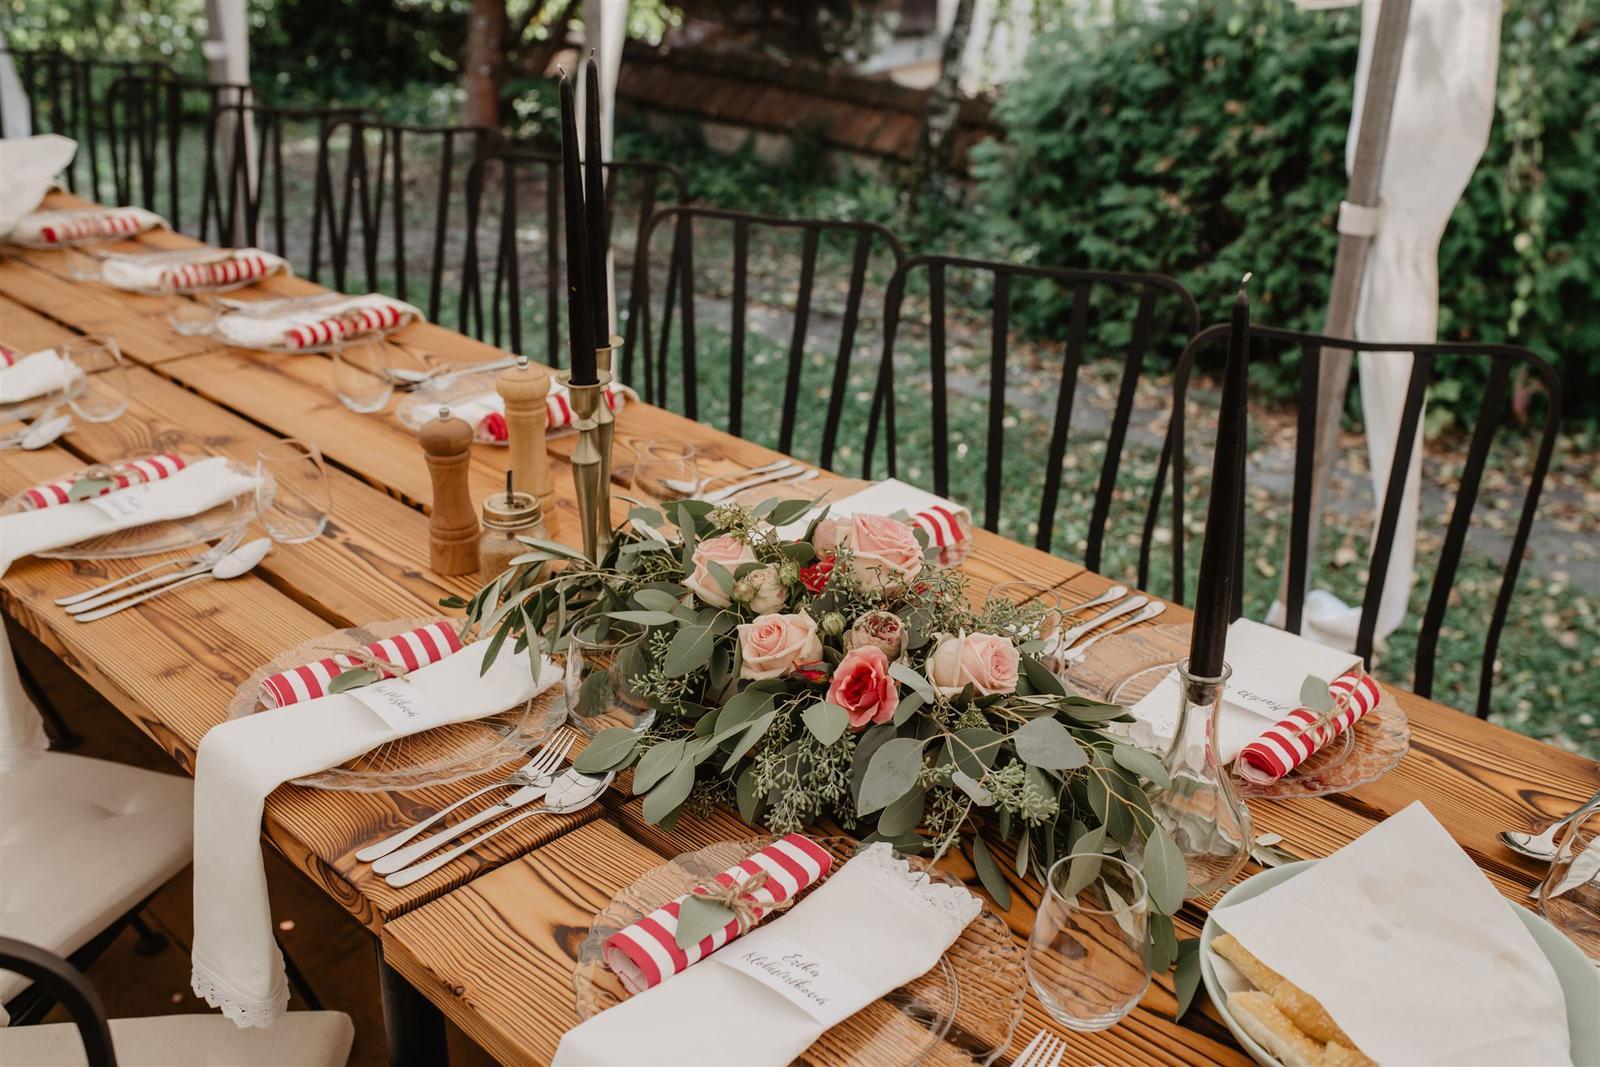 Krásna a romantická svadobná party v záhrade reštaurácie Bistra Dukát - Le Gout v srdci B. Bystrice. - Obrázok č. 4